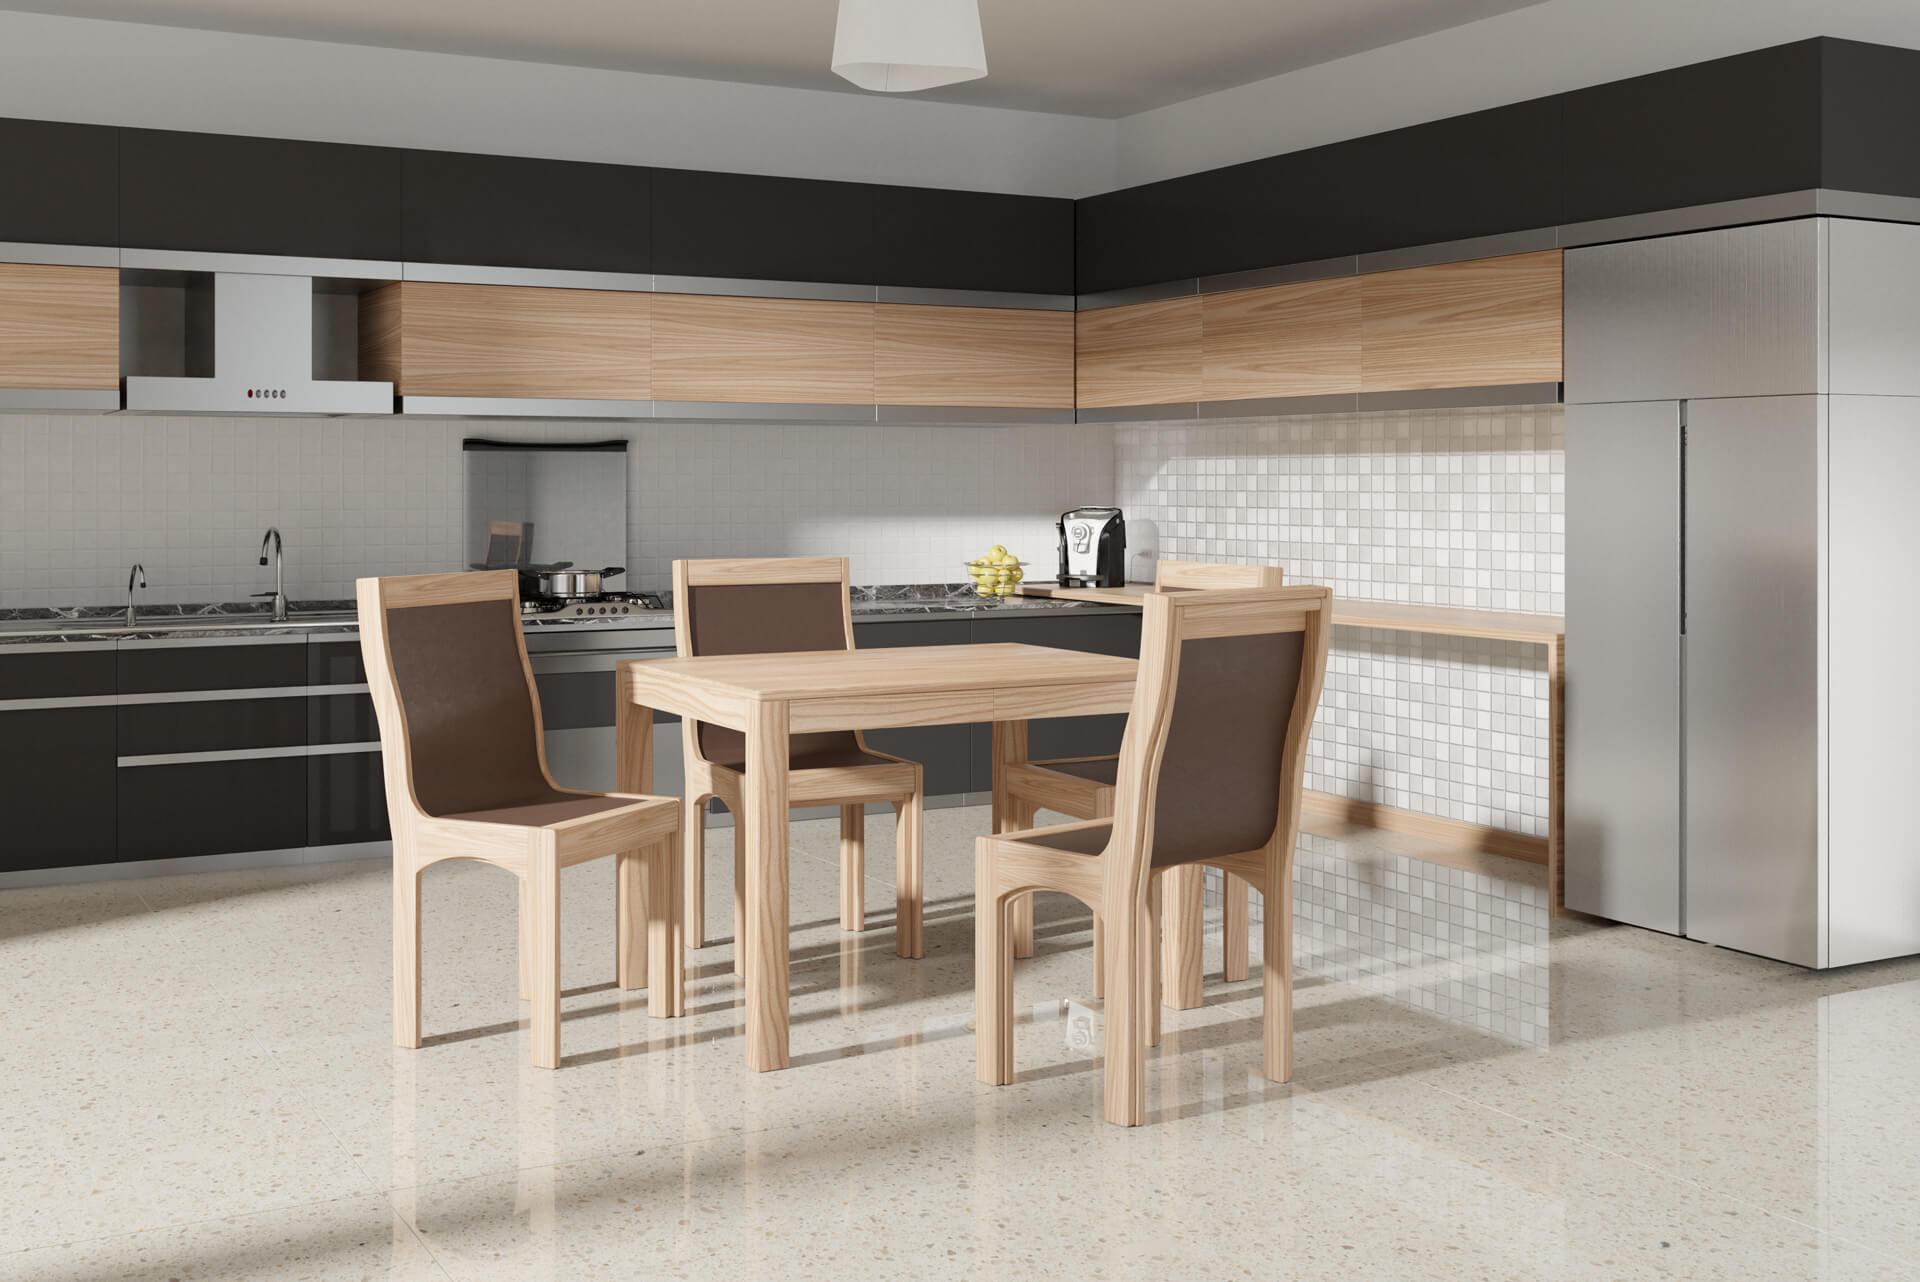 Tavoli per cucine piccole, alcune idee per avere funzionalità in ...